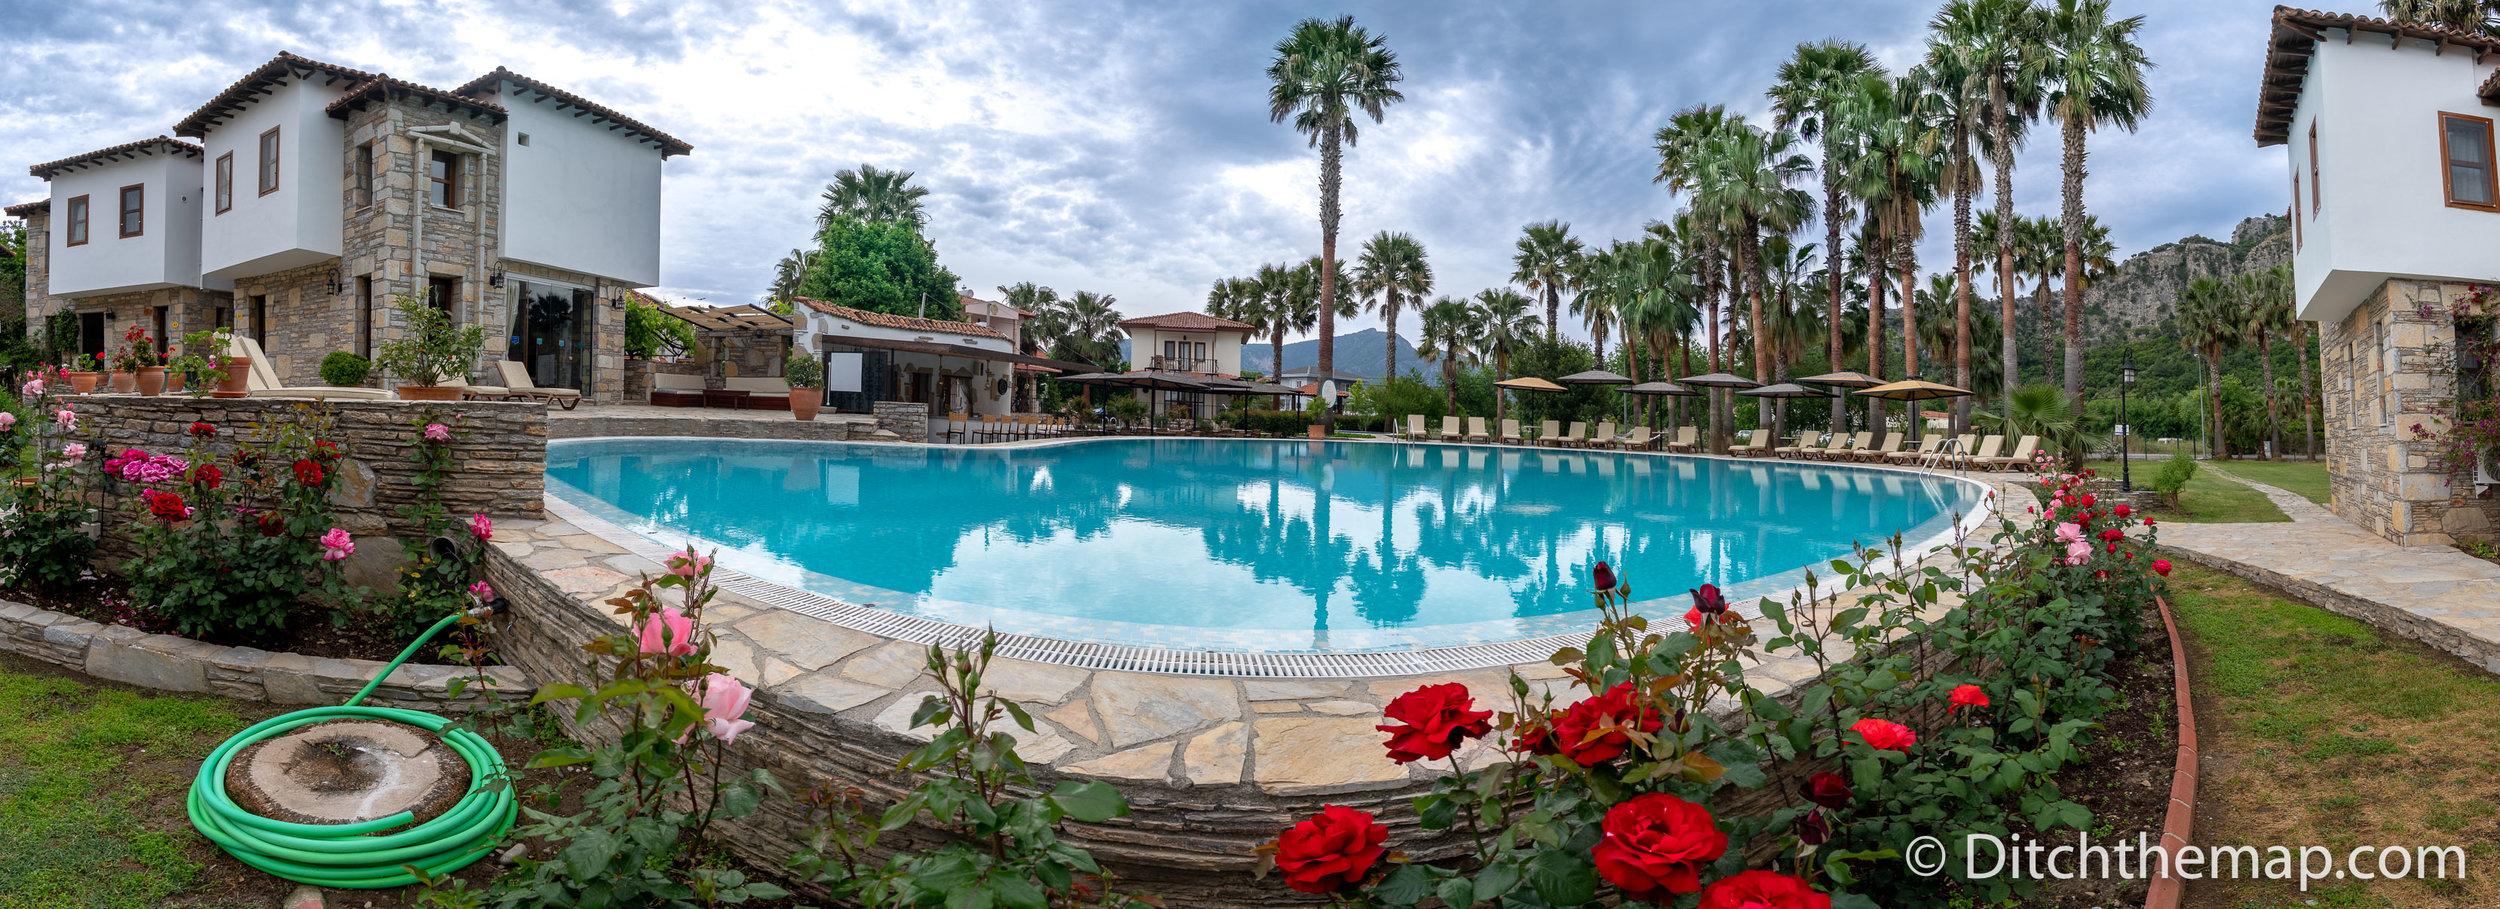 Osmanli Hani Apart Hotel  Our Beautiful Resort in Dalyan, Turkey